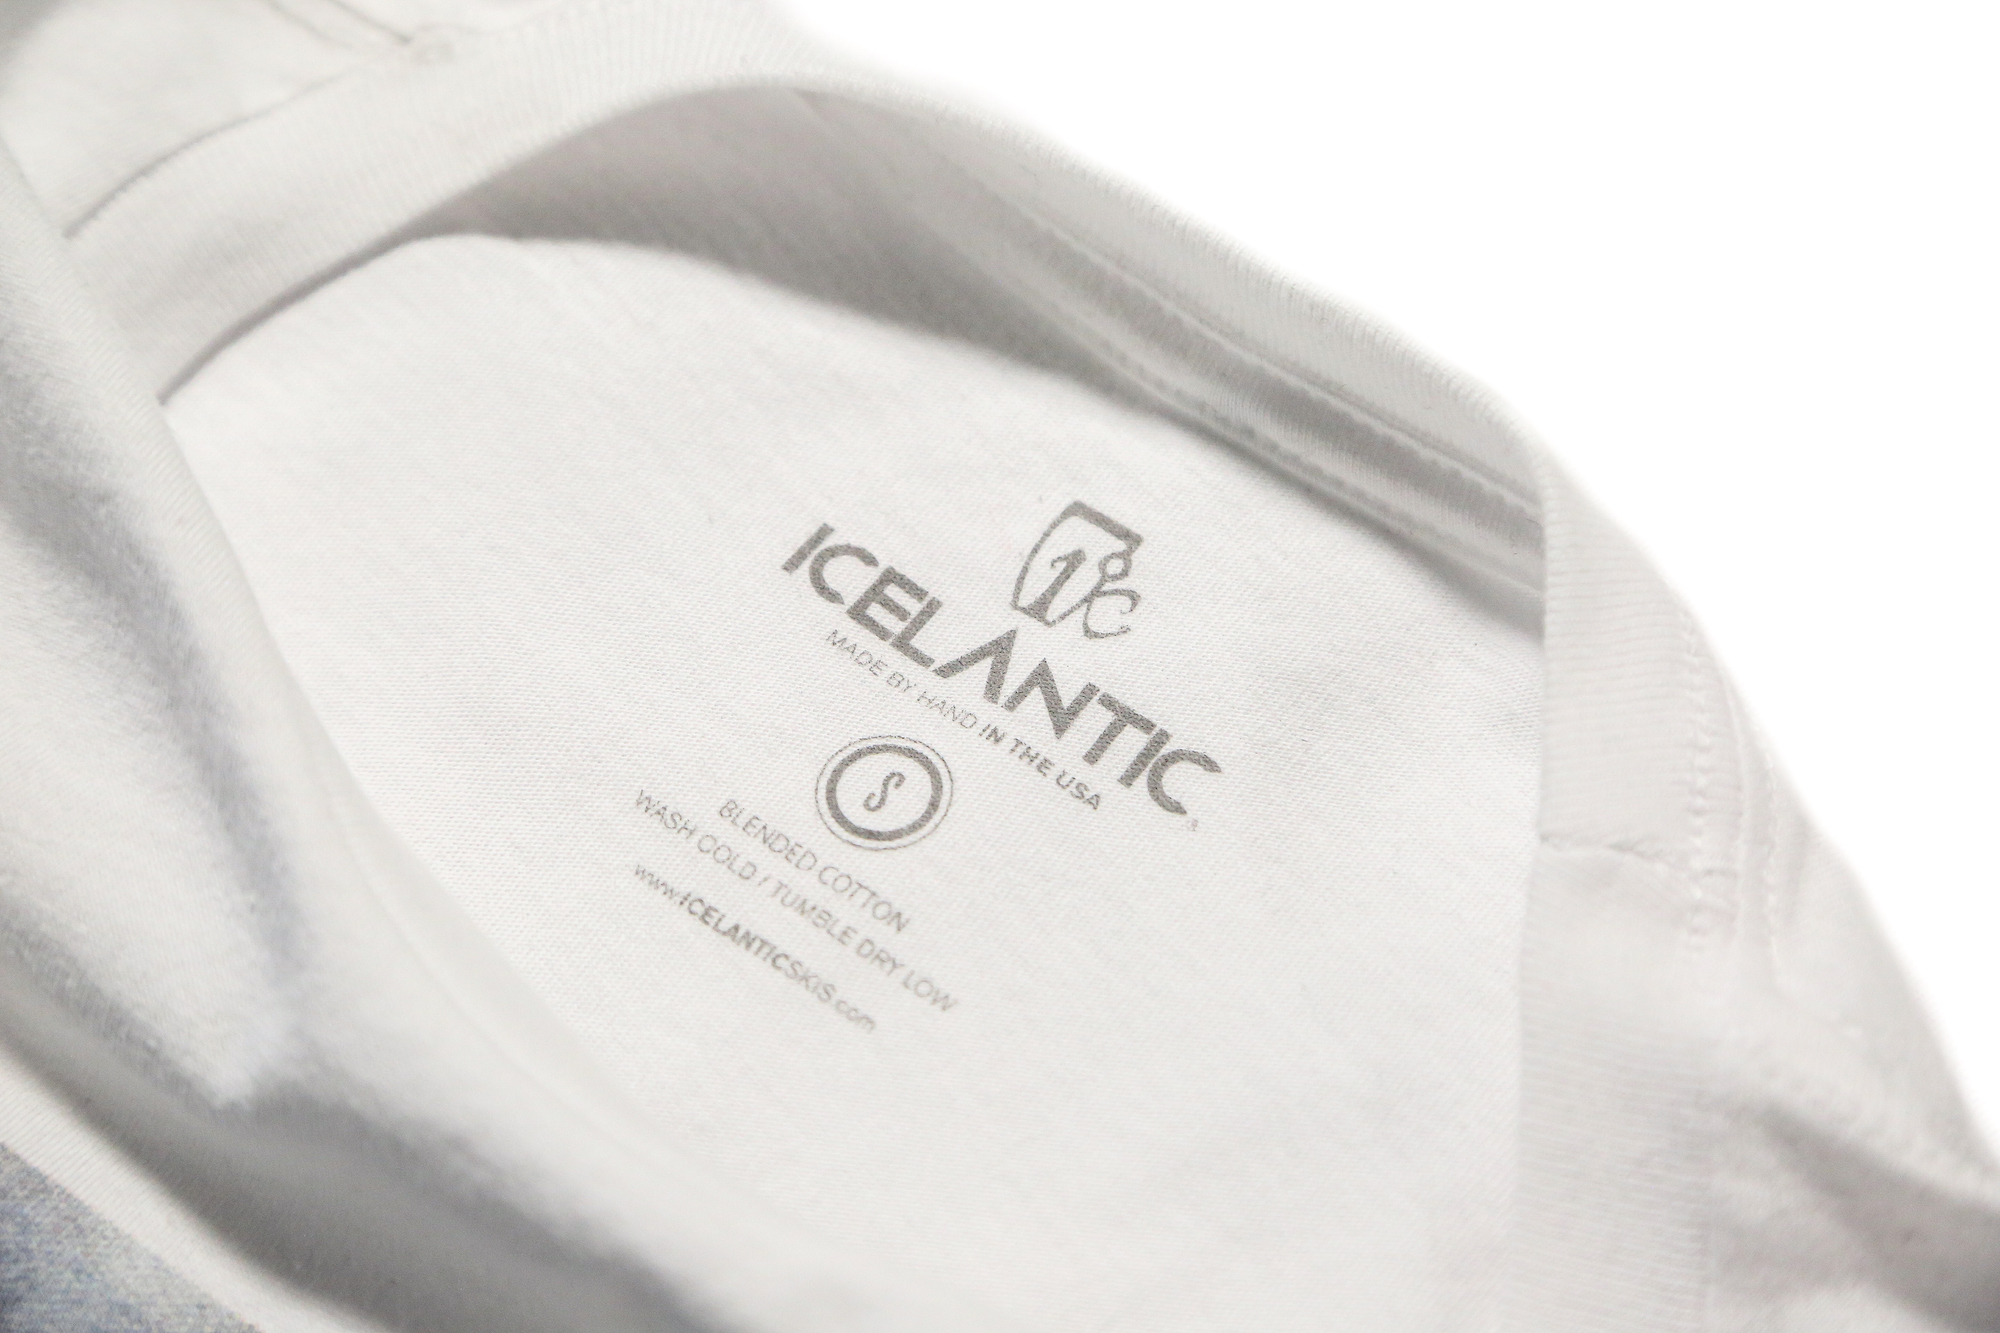 Icelantic printed neck tag on tee shirt